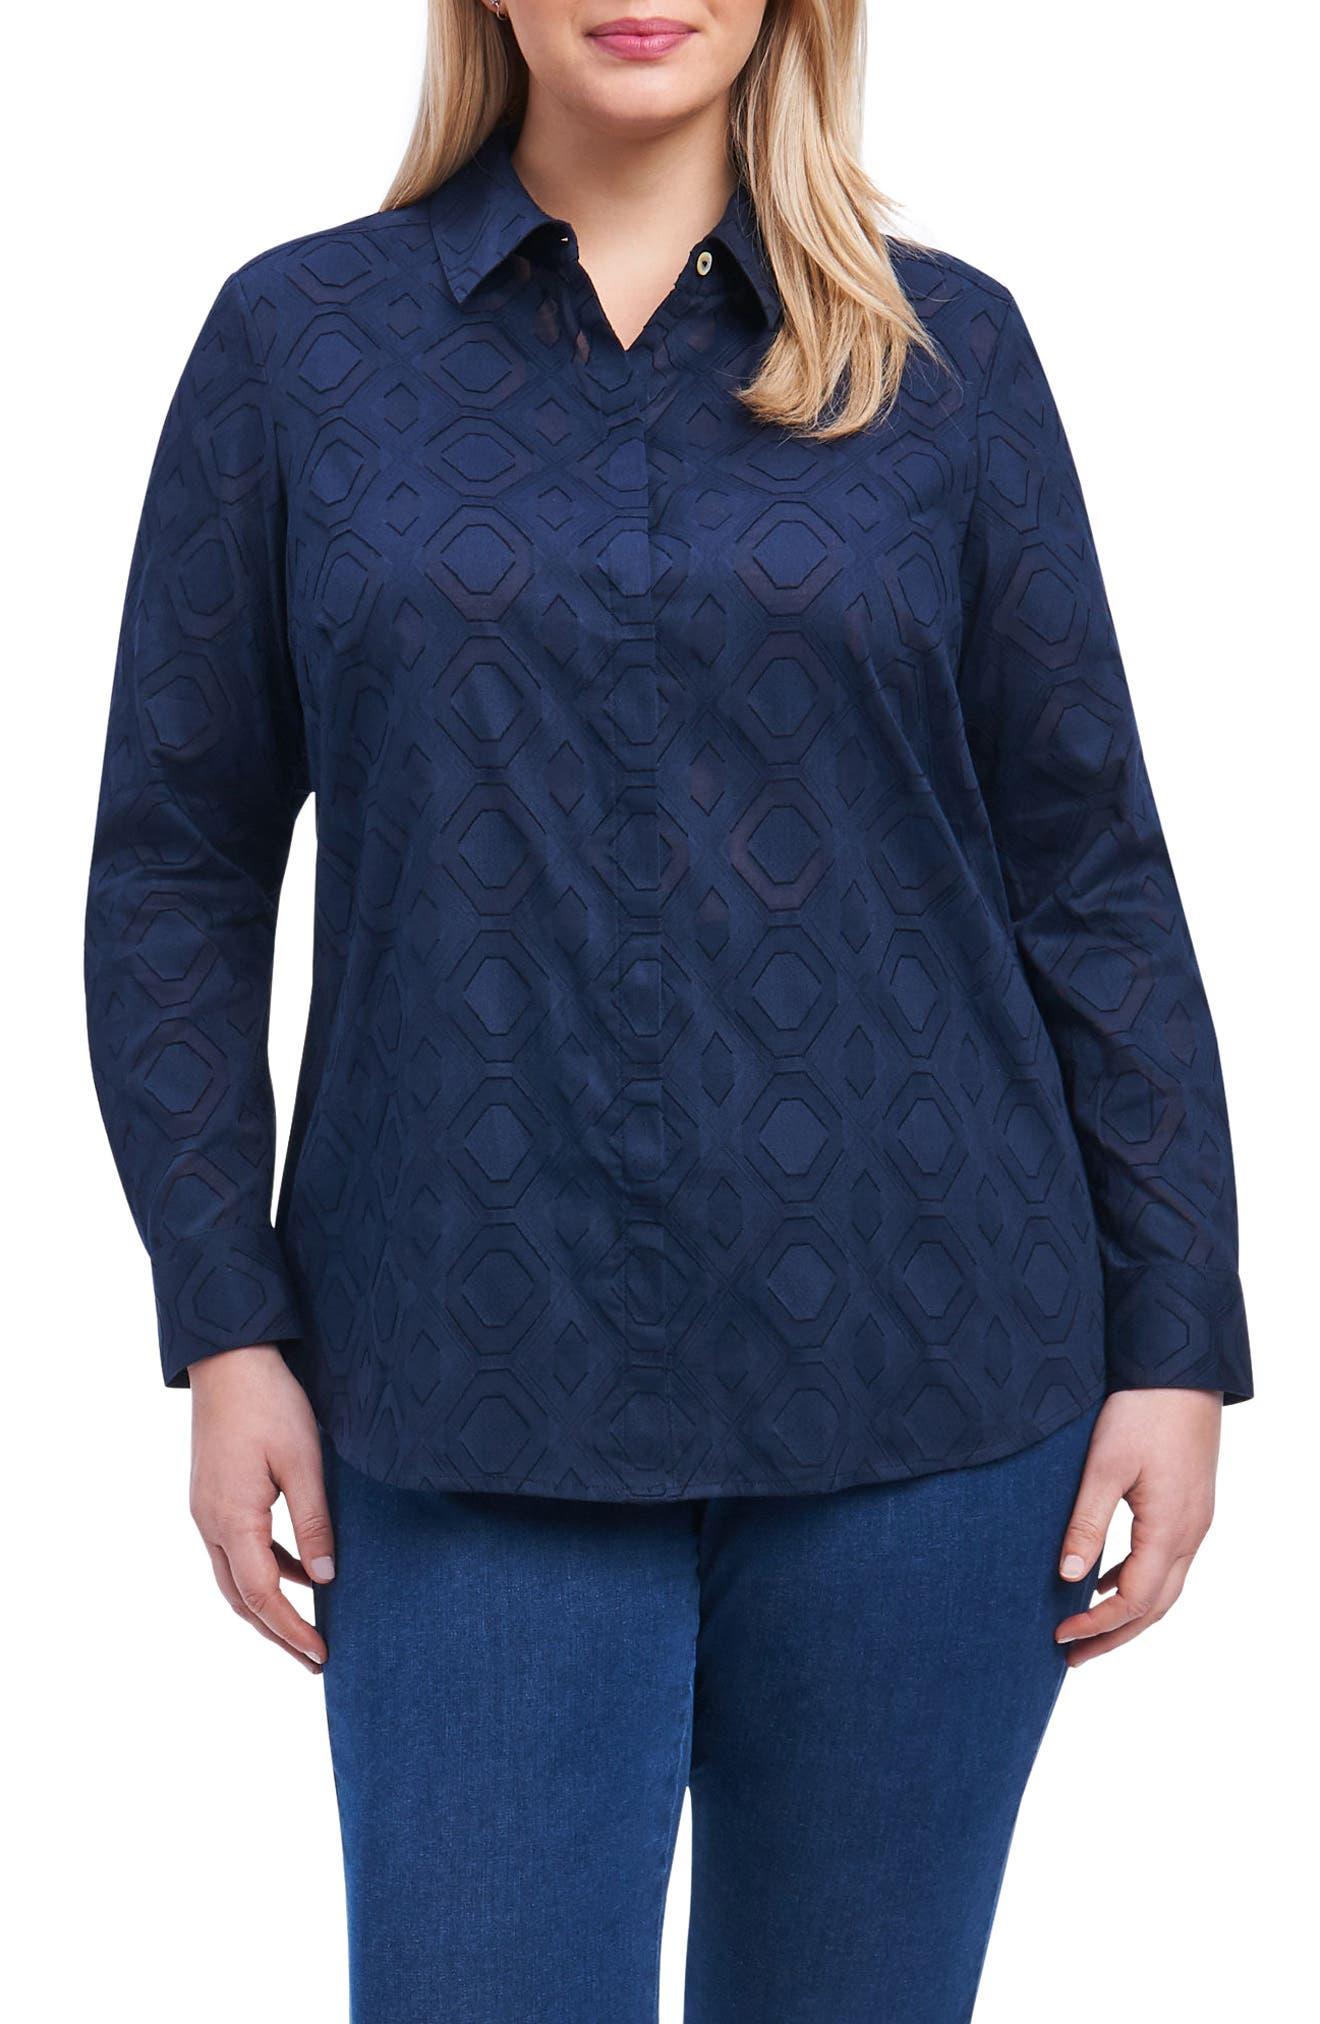 Foxcroft Ava Diamond Clip Jacquard Shirt (Plus Size)